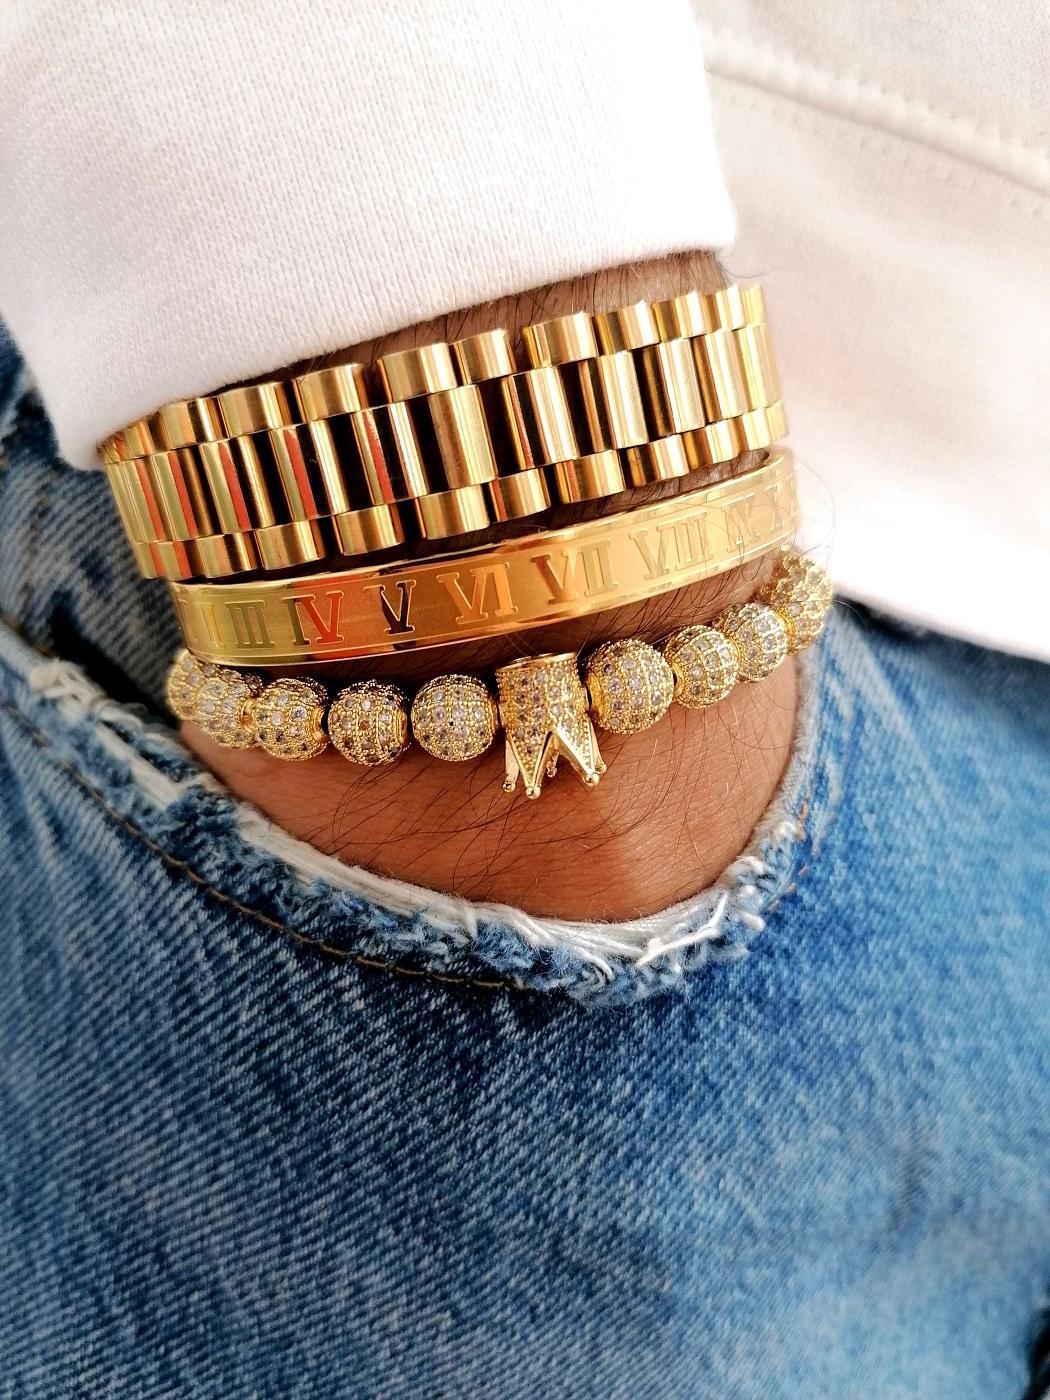 Diamond Crown Bracelet, Diamond Crown Bracelets, King And Queen Crown Bracelets, King And Queen Crown Charm Bracelet, King Bracelet Price, King Bracelet Set, Master Stack Bracelet, Men's Braided Bracelet, Mens Bracelets, White Gold And Diamond Bangle